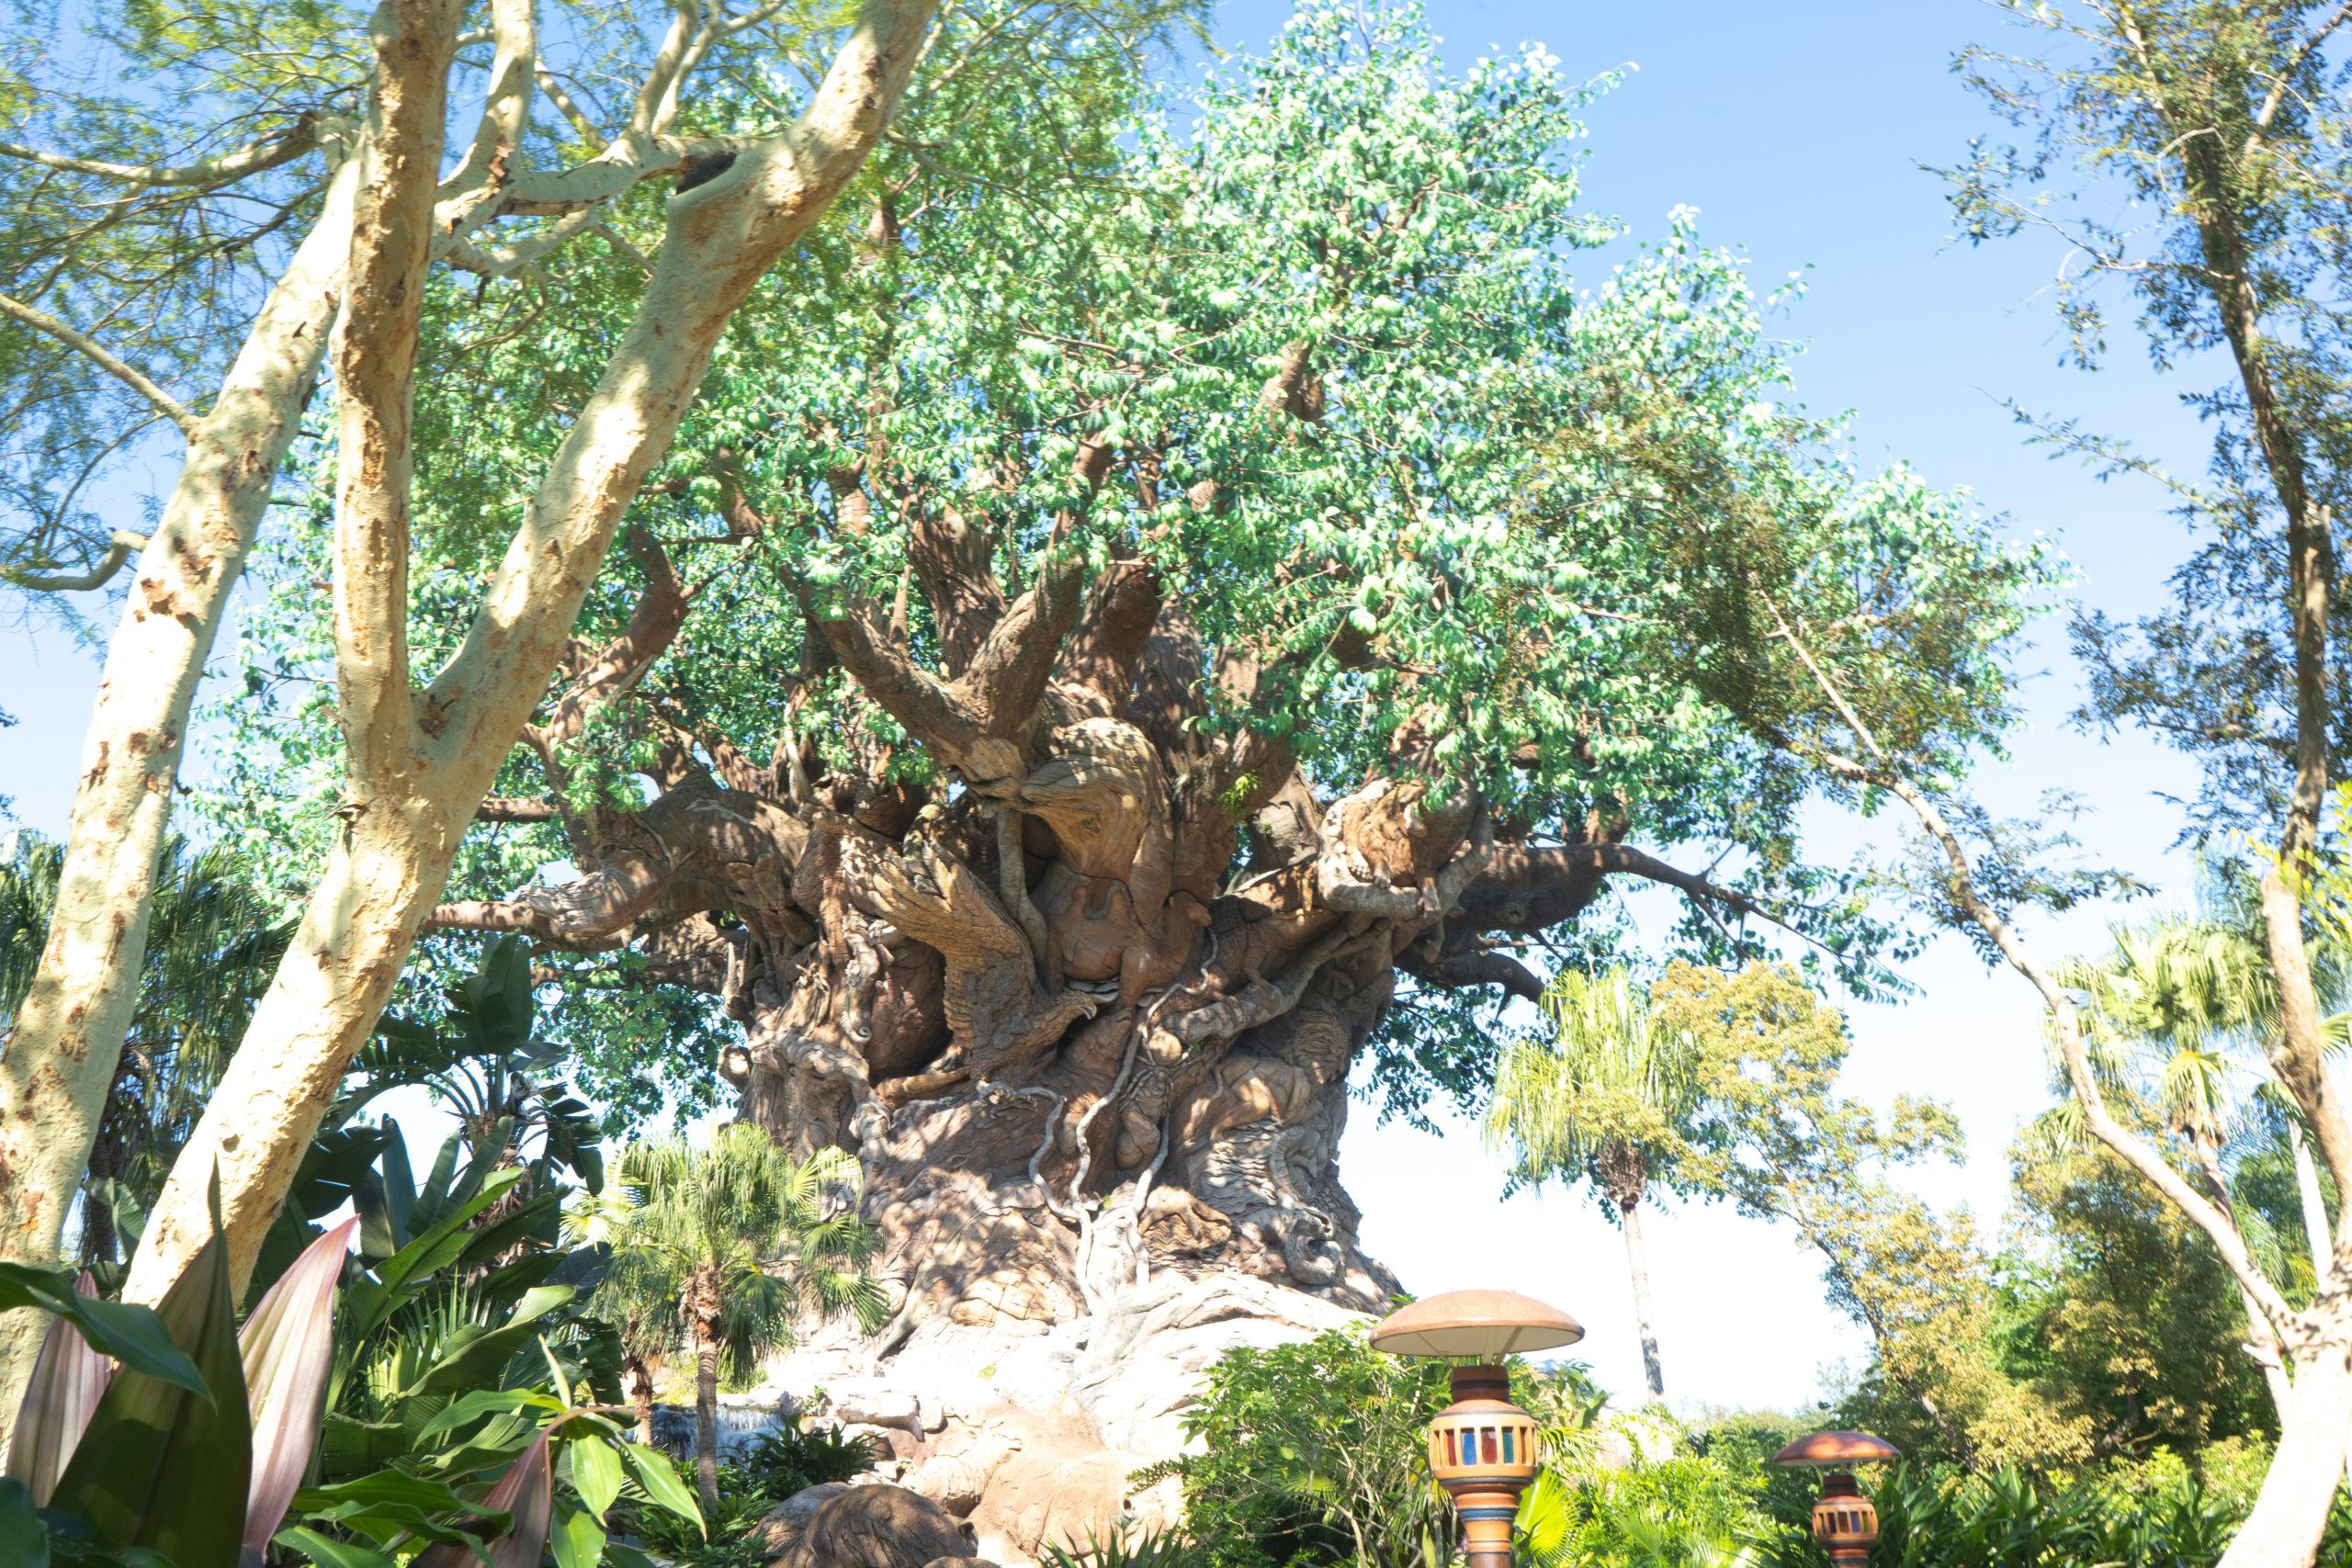 Animal Kingdom Tree of Life on a sunny day